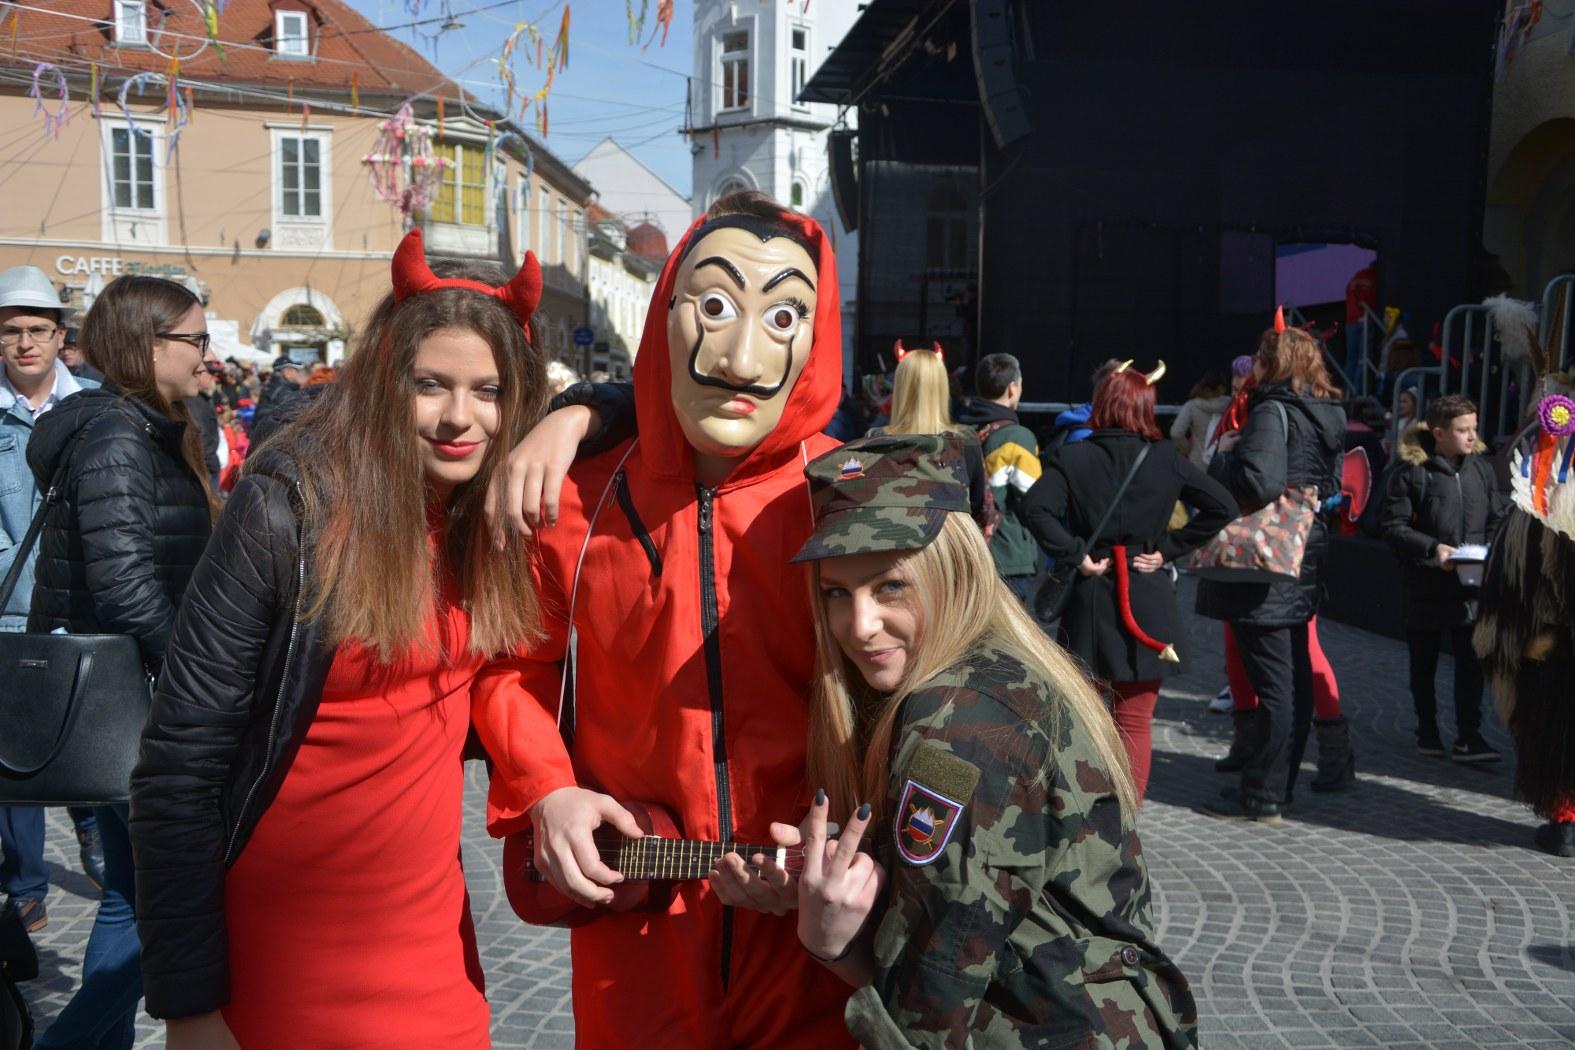 2019_03_05_pustni_torek-25_1575x1050